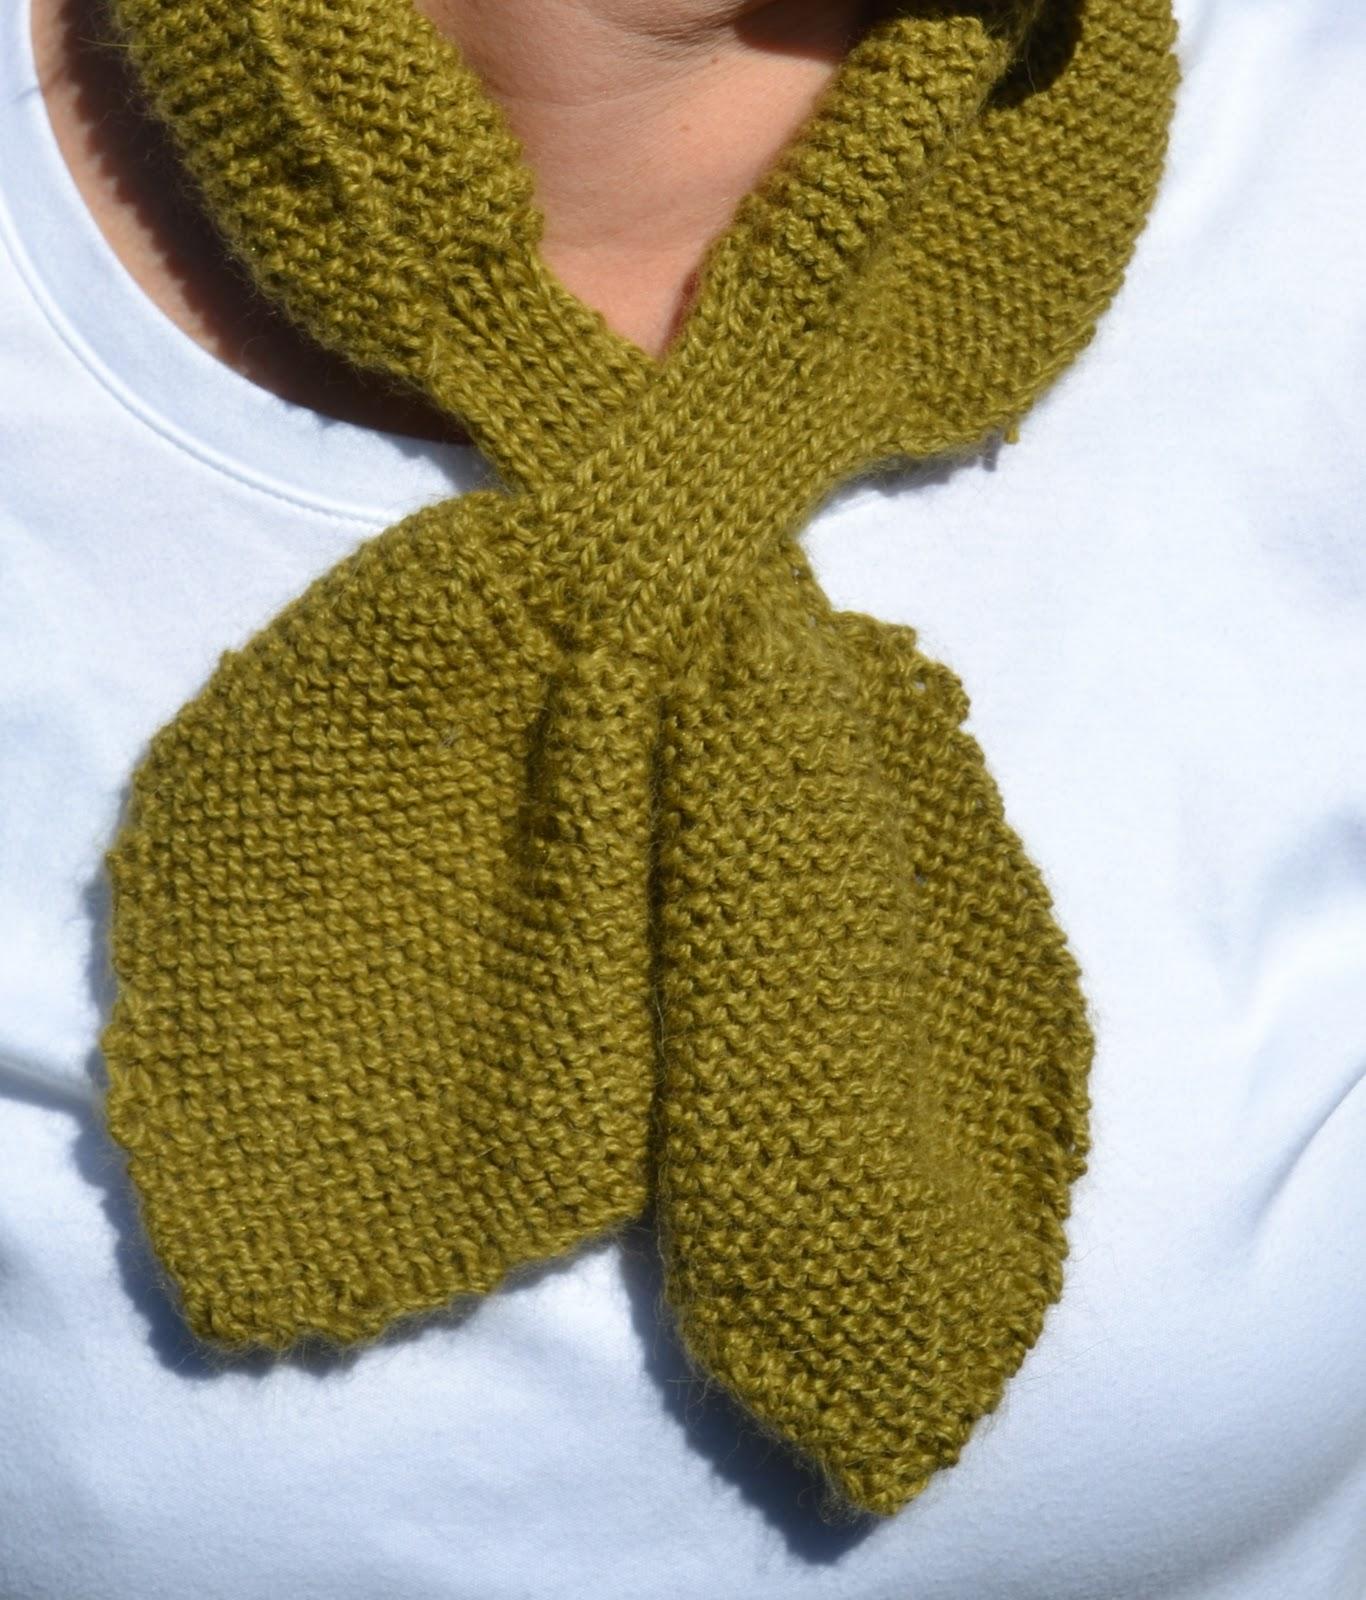 Knitting Holidays Scotland : Spinsjal vintage knitting fo grandma helen s knitted scarf